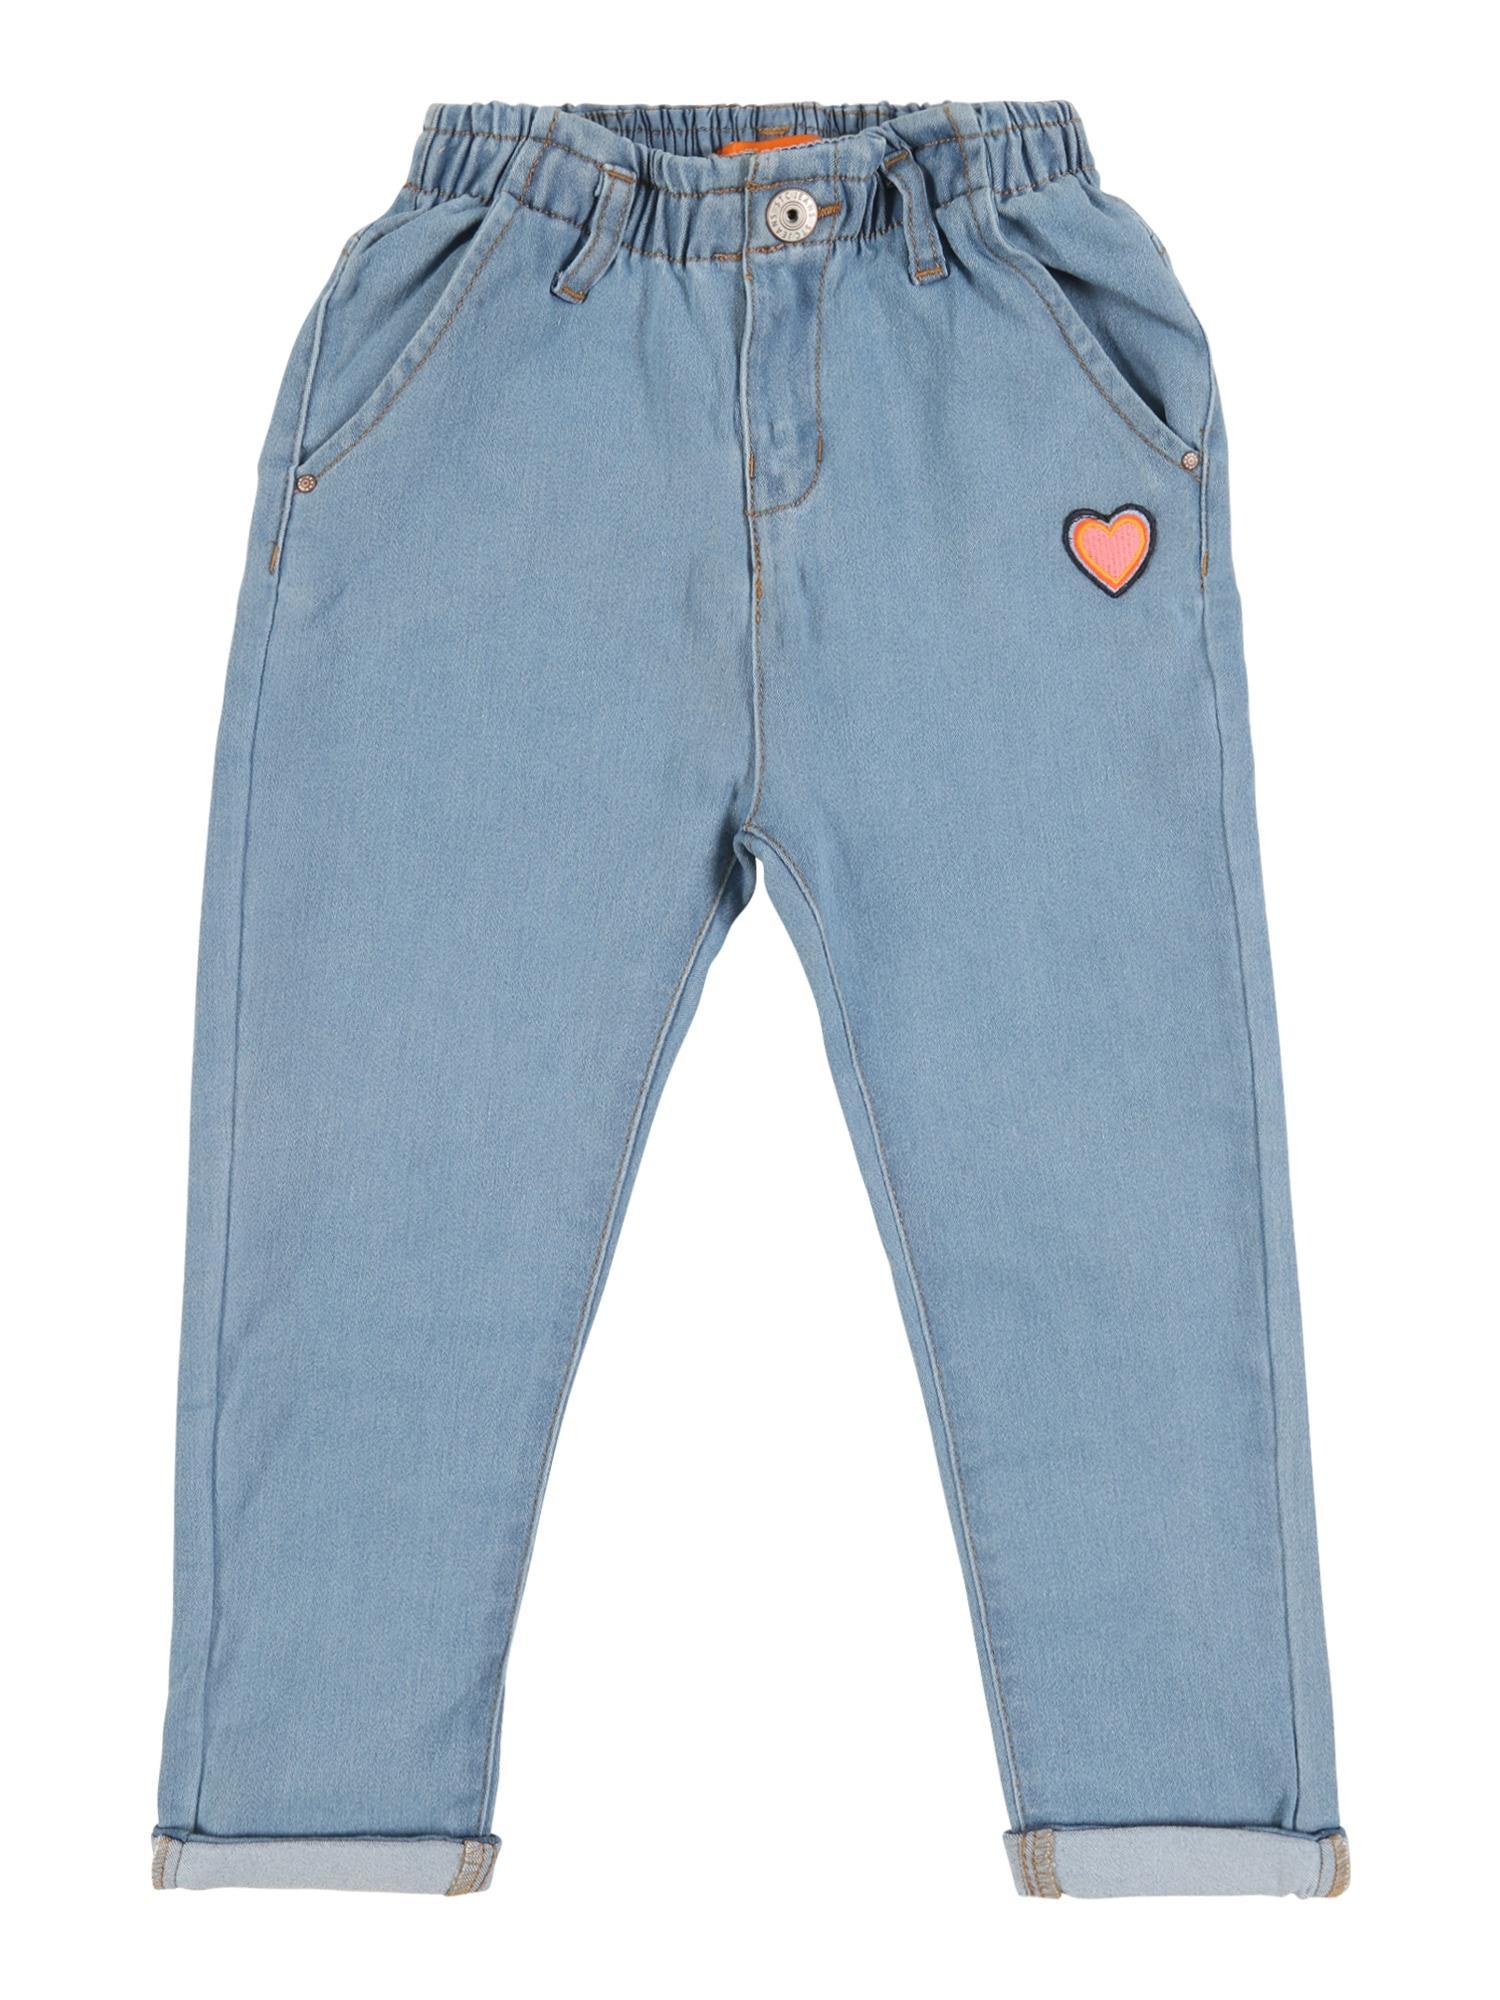 STACCATO Kelnės 'Md.-Culotte' tamsiai (džinso) mėlyna